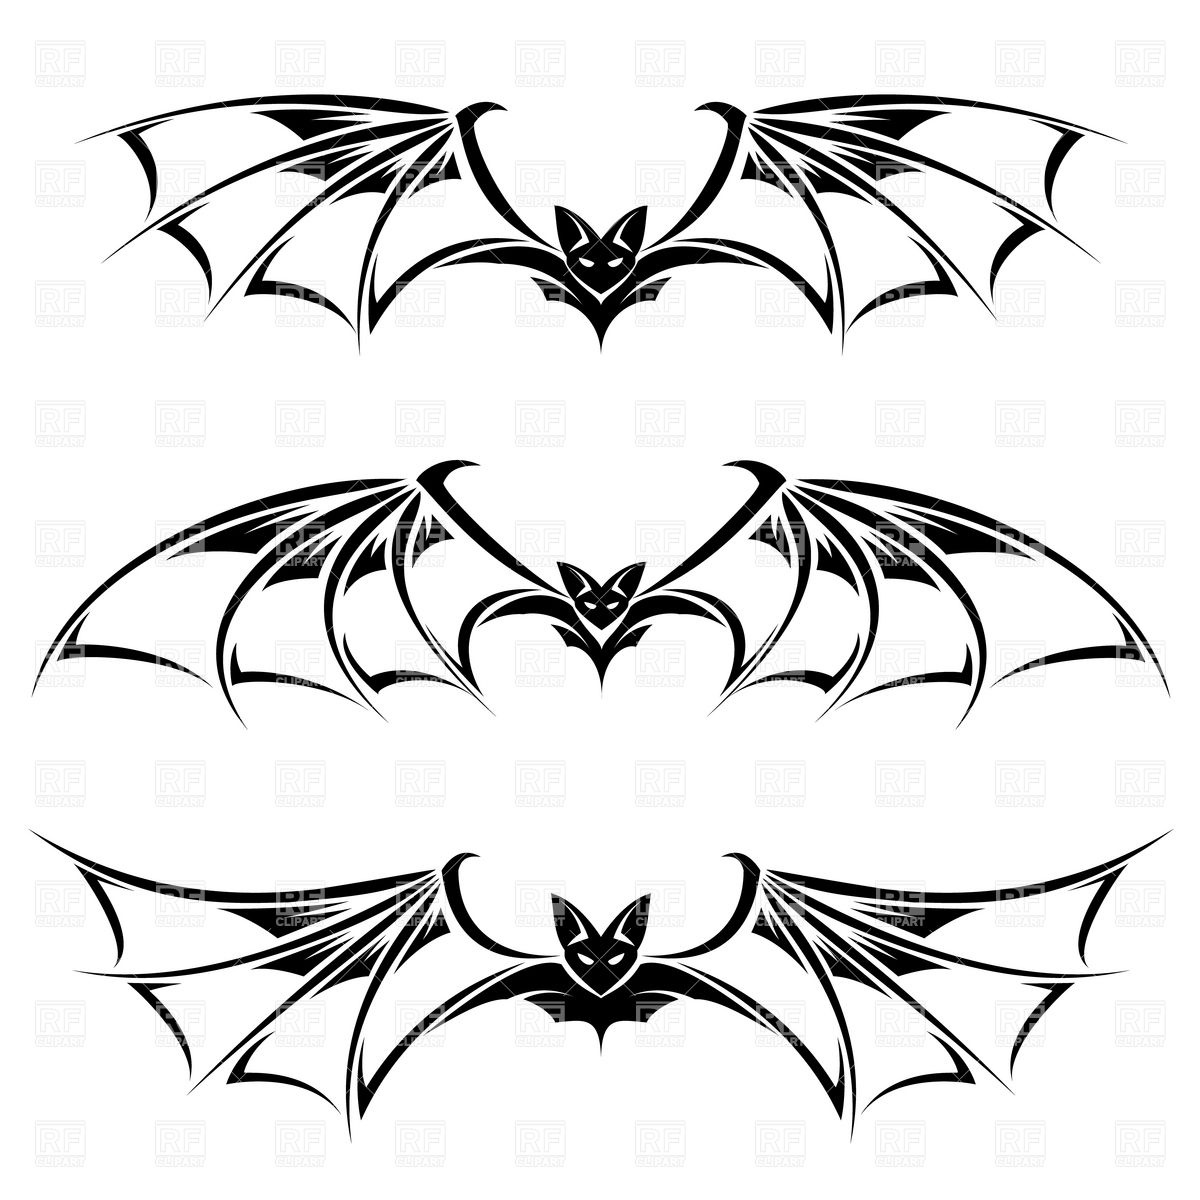 Bat Wings Clipart | Clipart Panda - Free Clipart Images